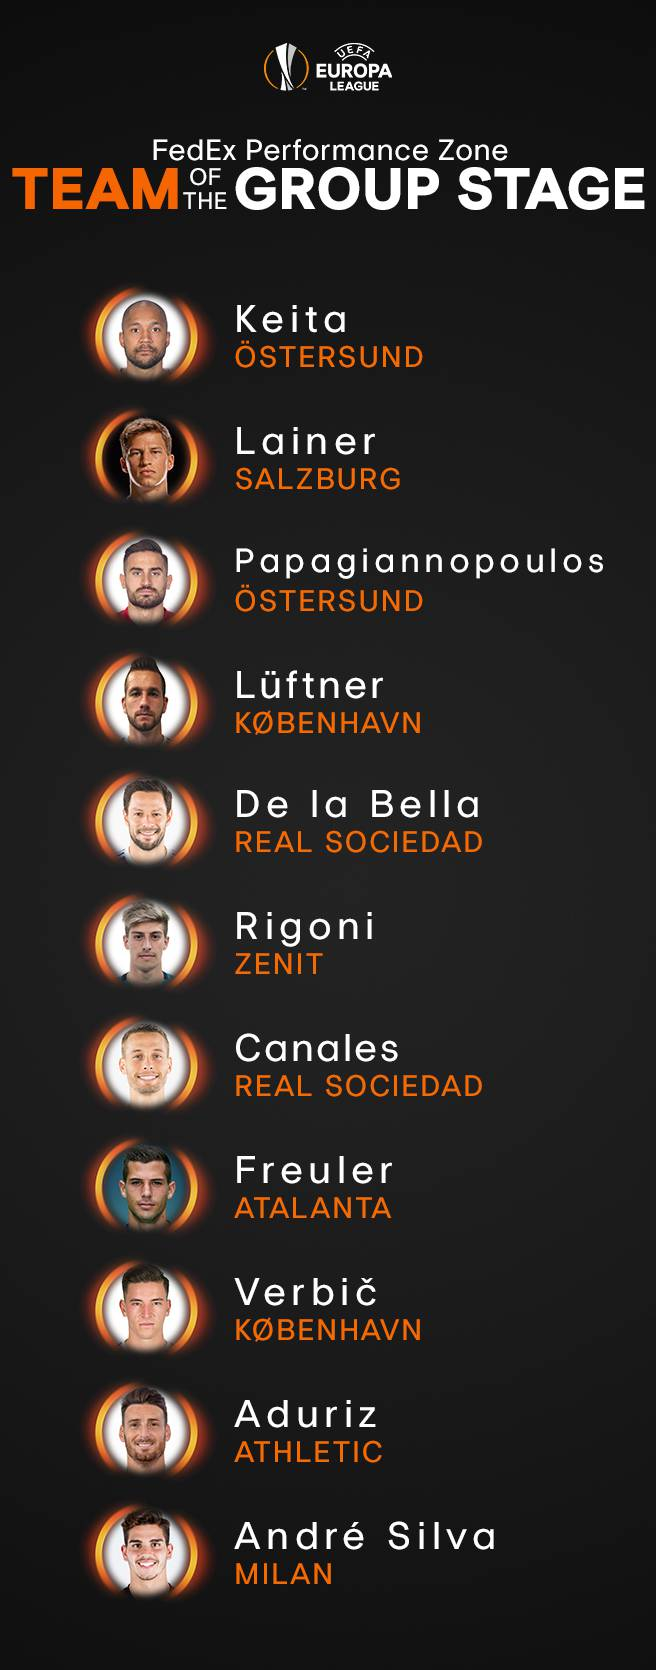 UEFa Europa league top 11